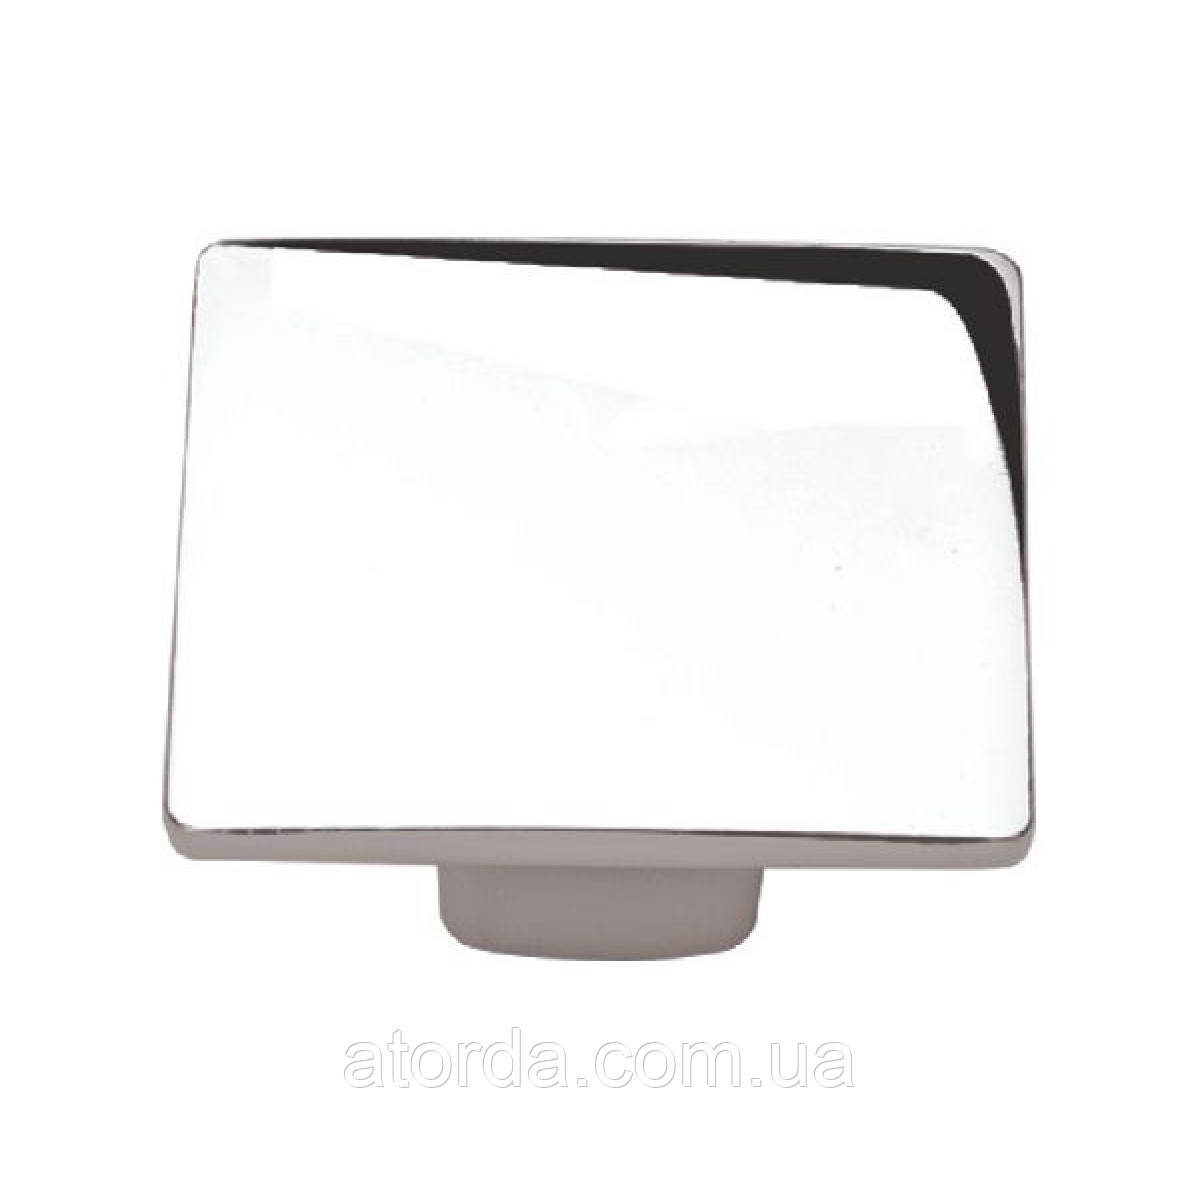 Ручка мебельная Ozkardesler 6084-06 DEFNE DUGME Хром